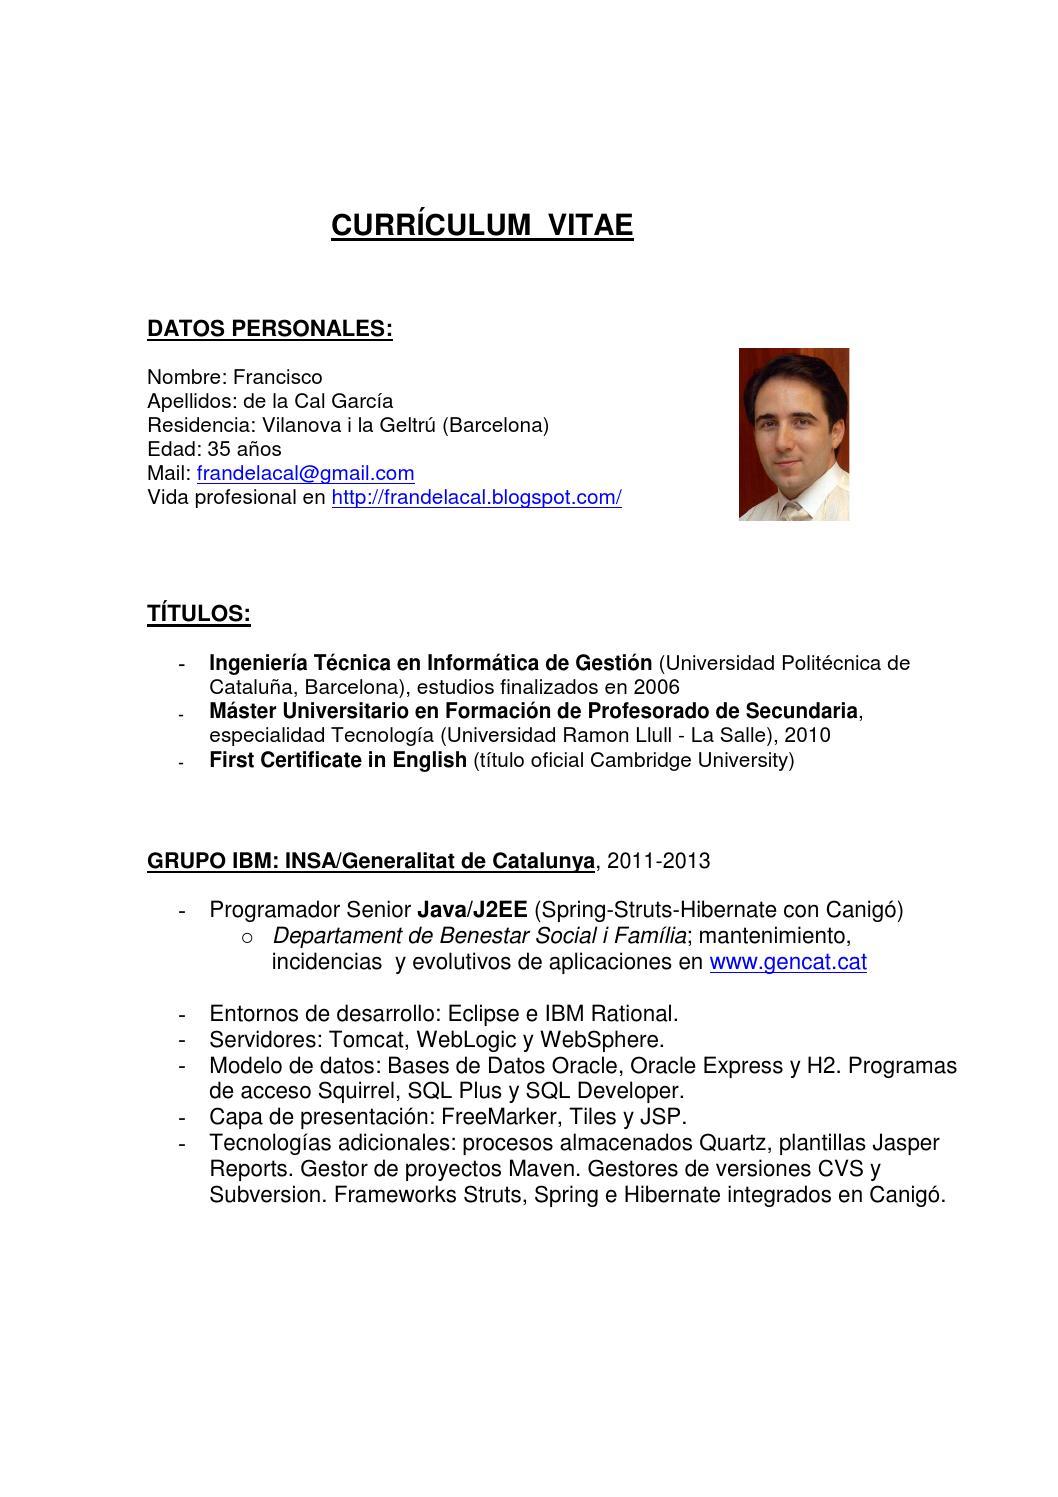 Asombroso Plantilla De Curriculum Vitae Desarrollador Java Modelo ...